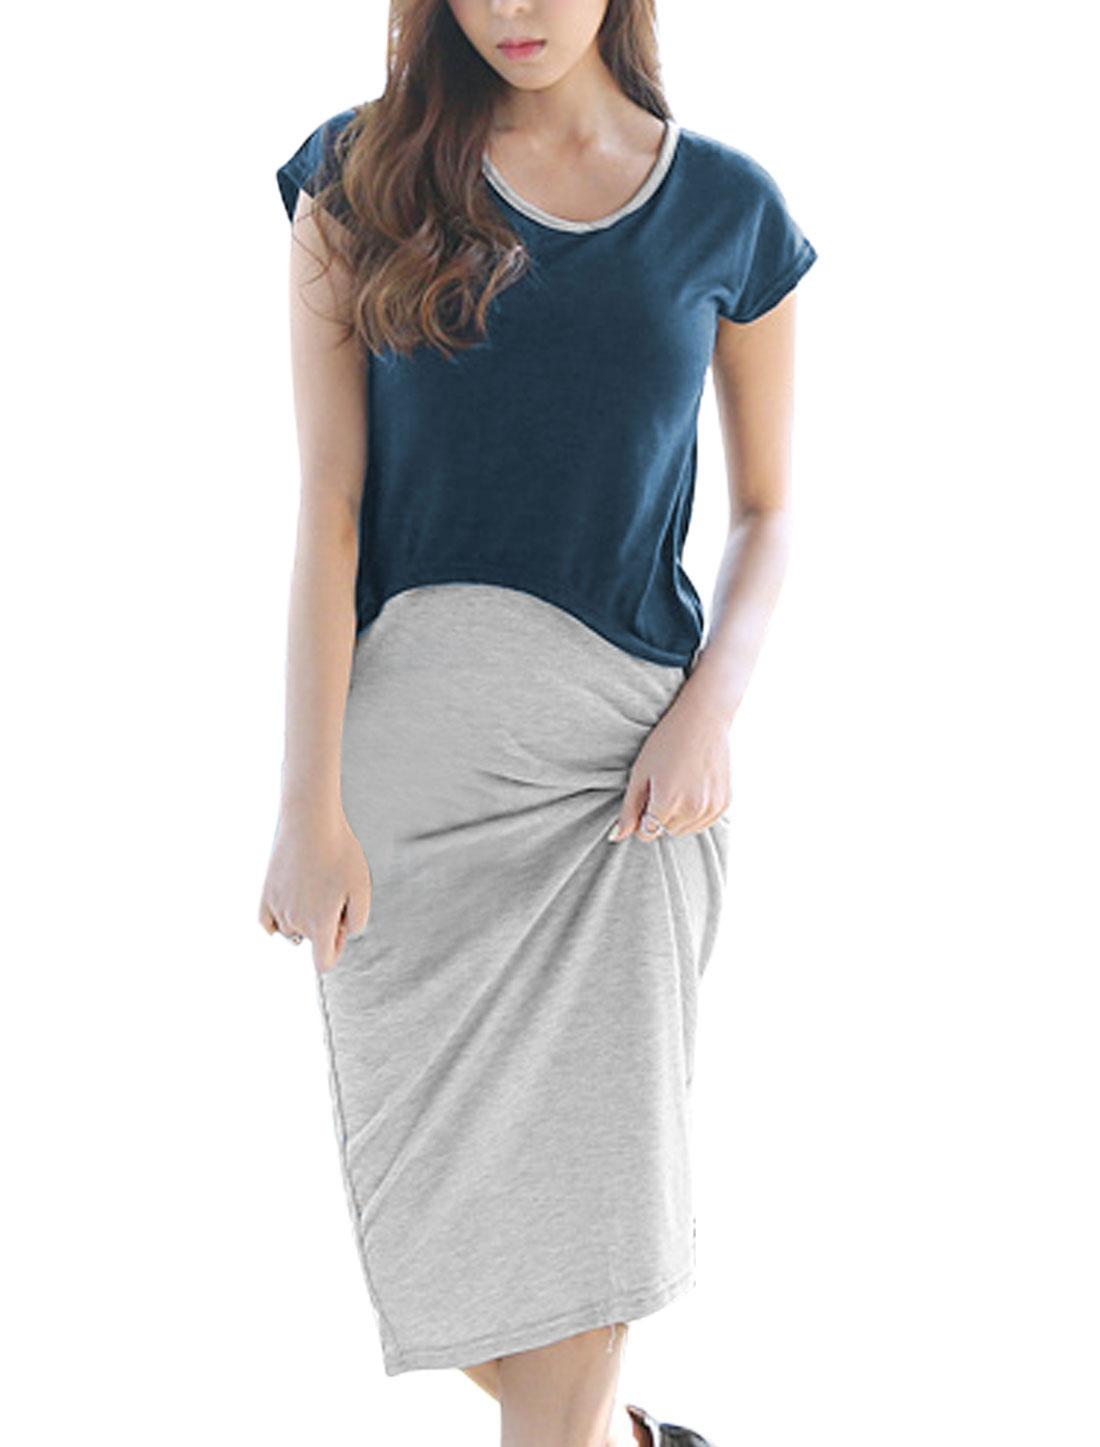 Women Dolman Sleeves Casual Tops w Sleeveless Midi Dress Navy Blue Light Gray S